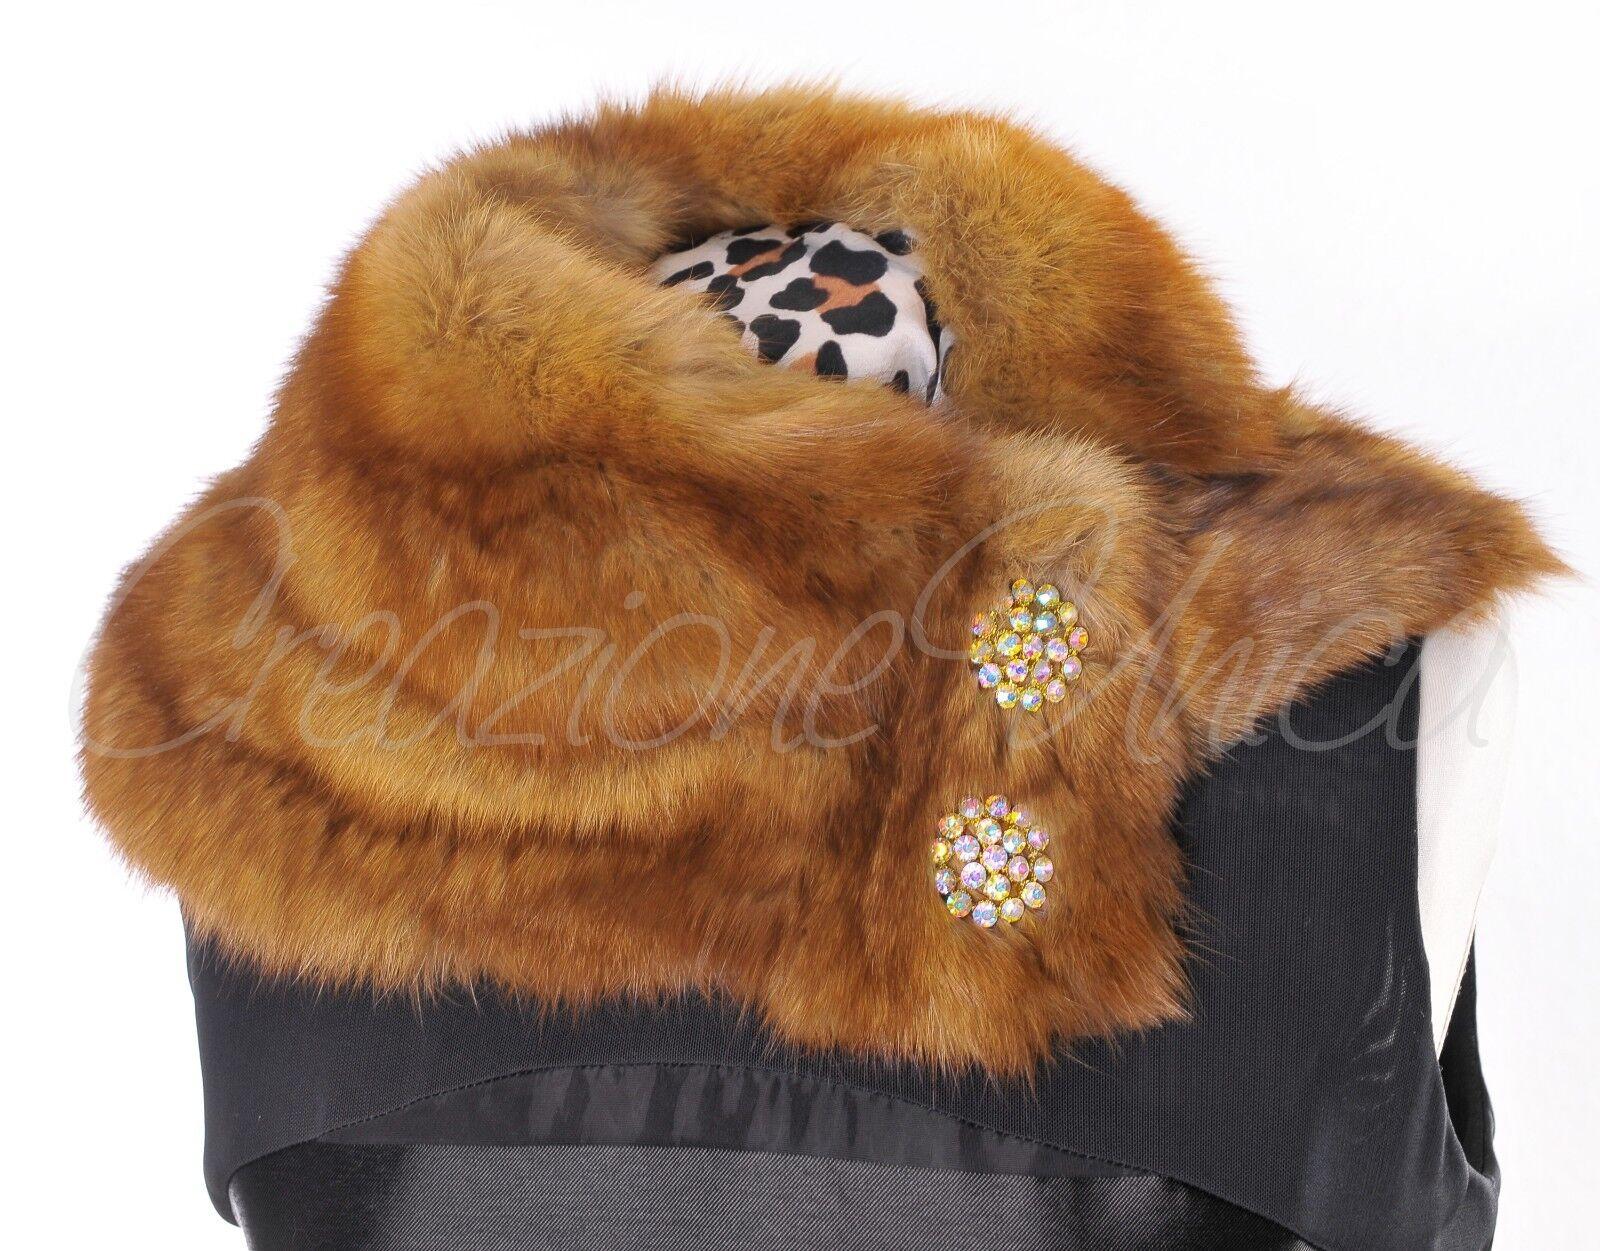 Luxus Pelz Pelz Pelz Schal Zobel Sable fur scarf pelliccia zibellino sciarpa Piel zibeline 7a1e1e